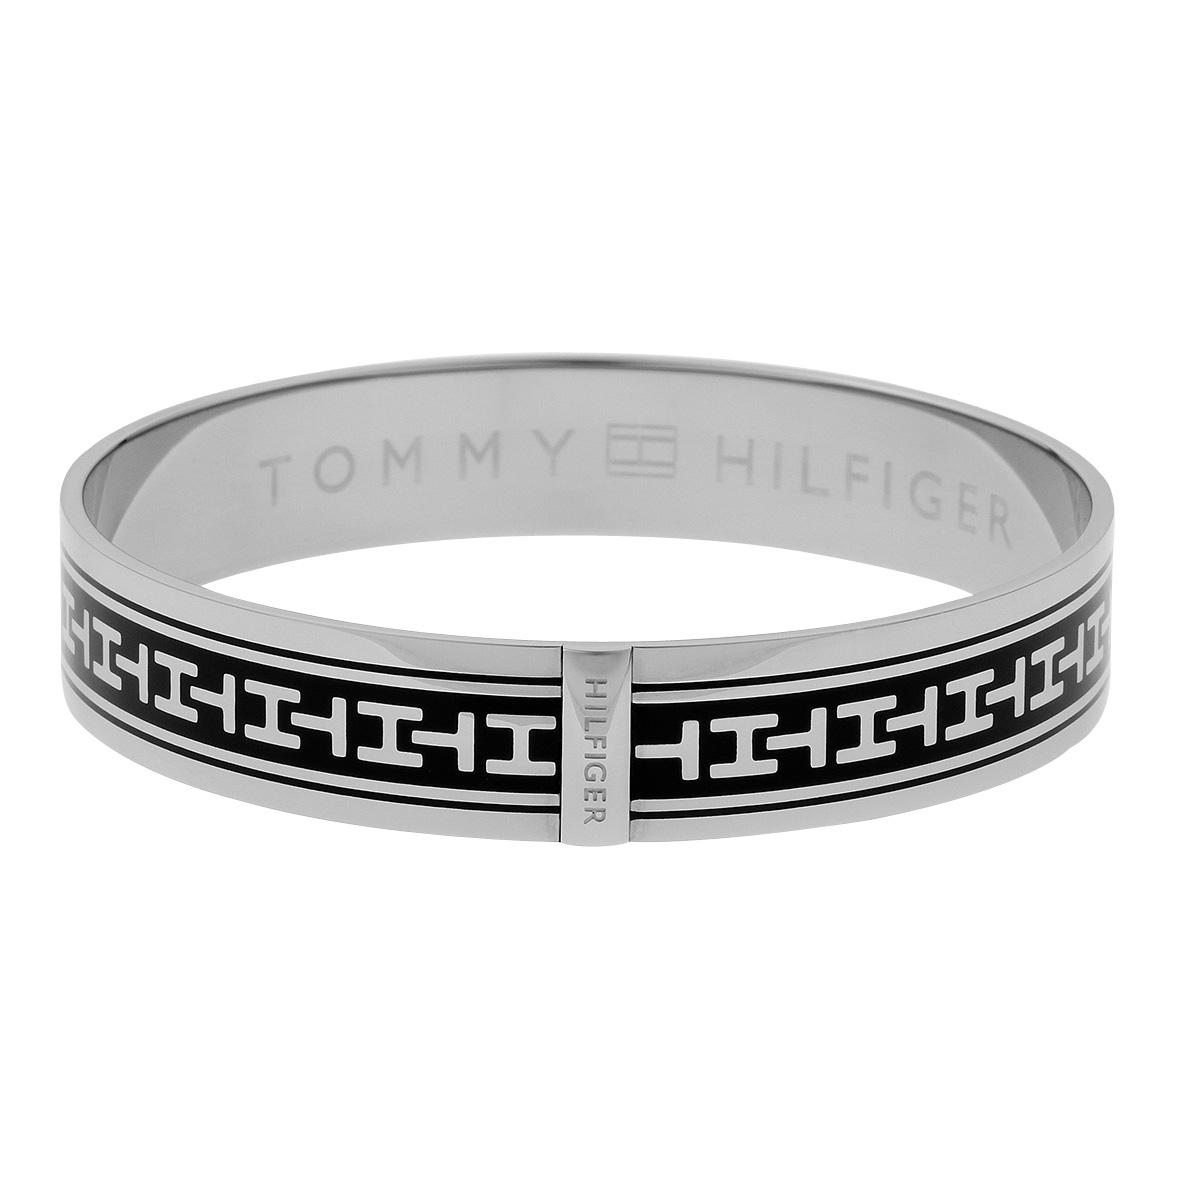 tommy hilfiger black jewellery bracelet 2700023 ladies authentic accessory ebay. Black Bedroom Furniture Sets. Home Design Ideas